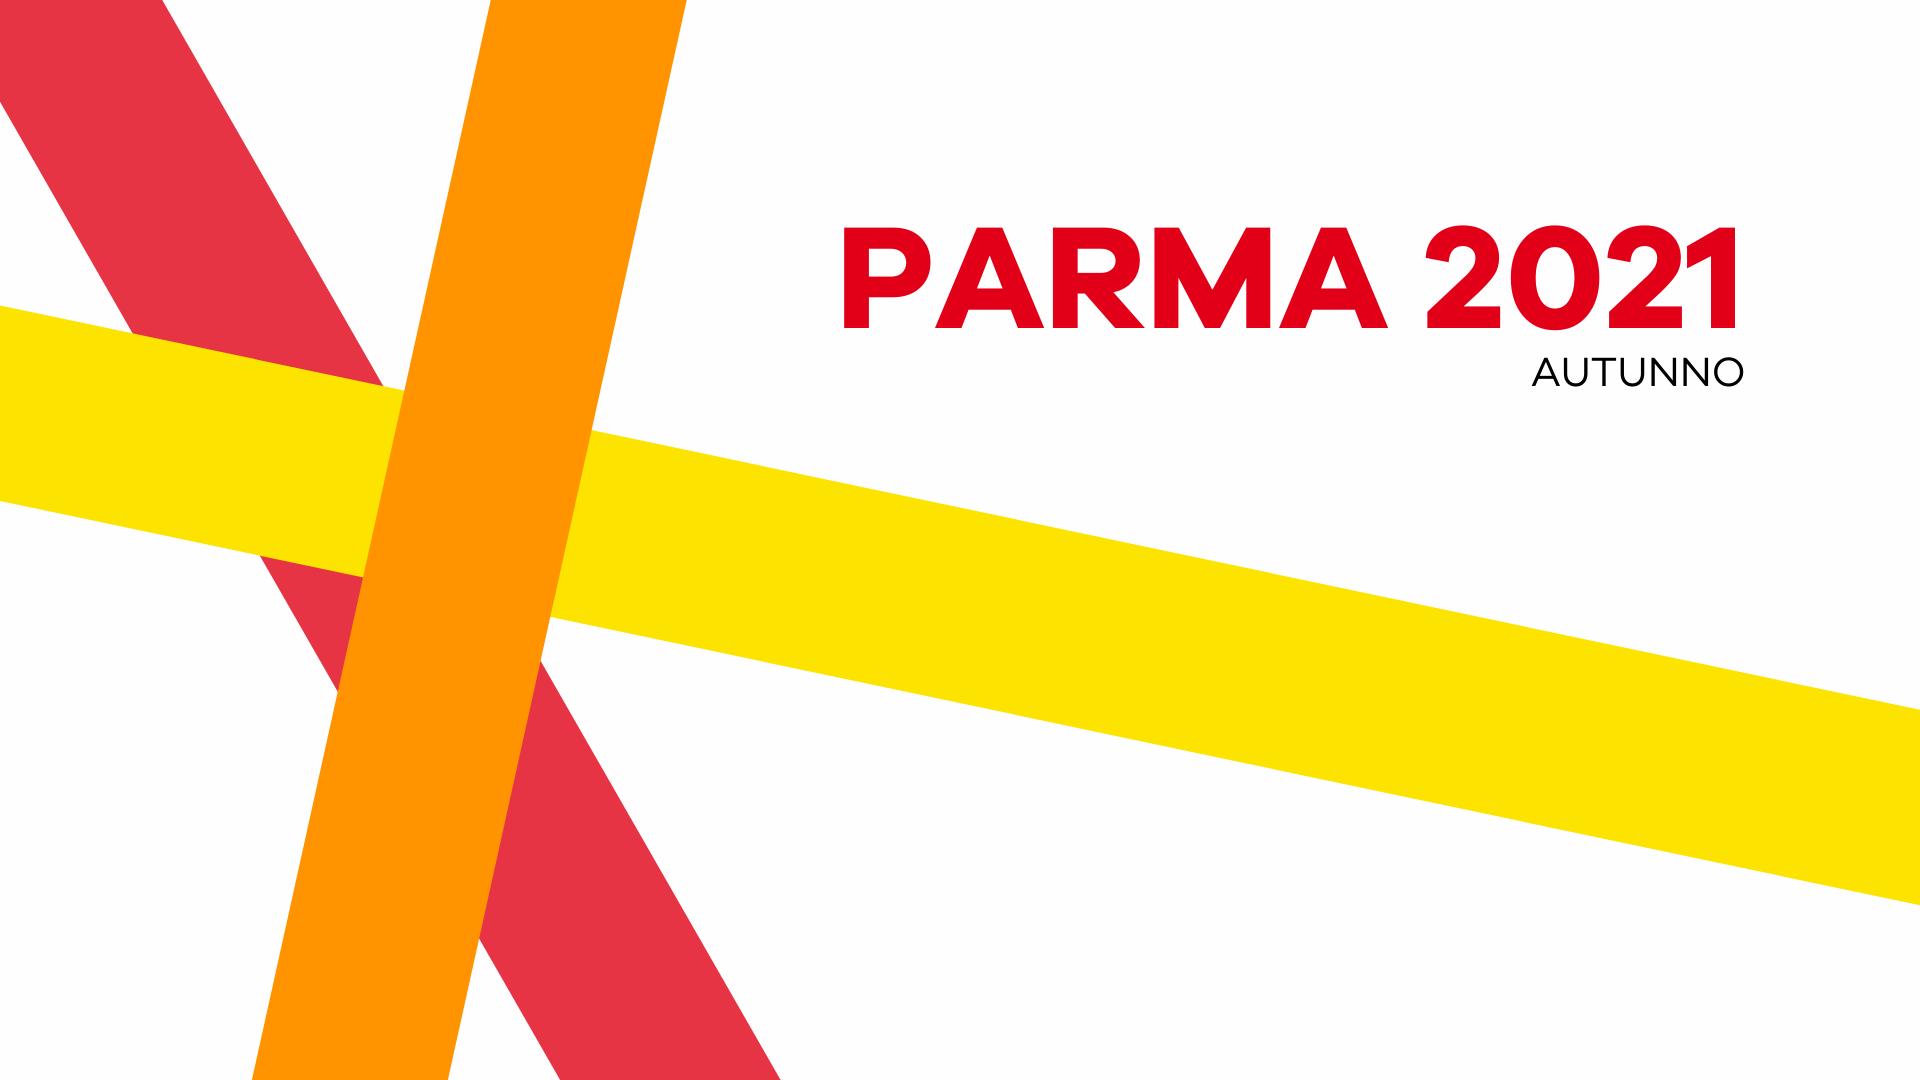 Parma 2021 Online